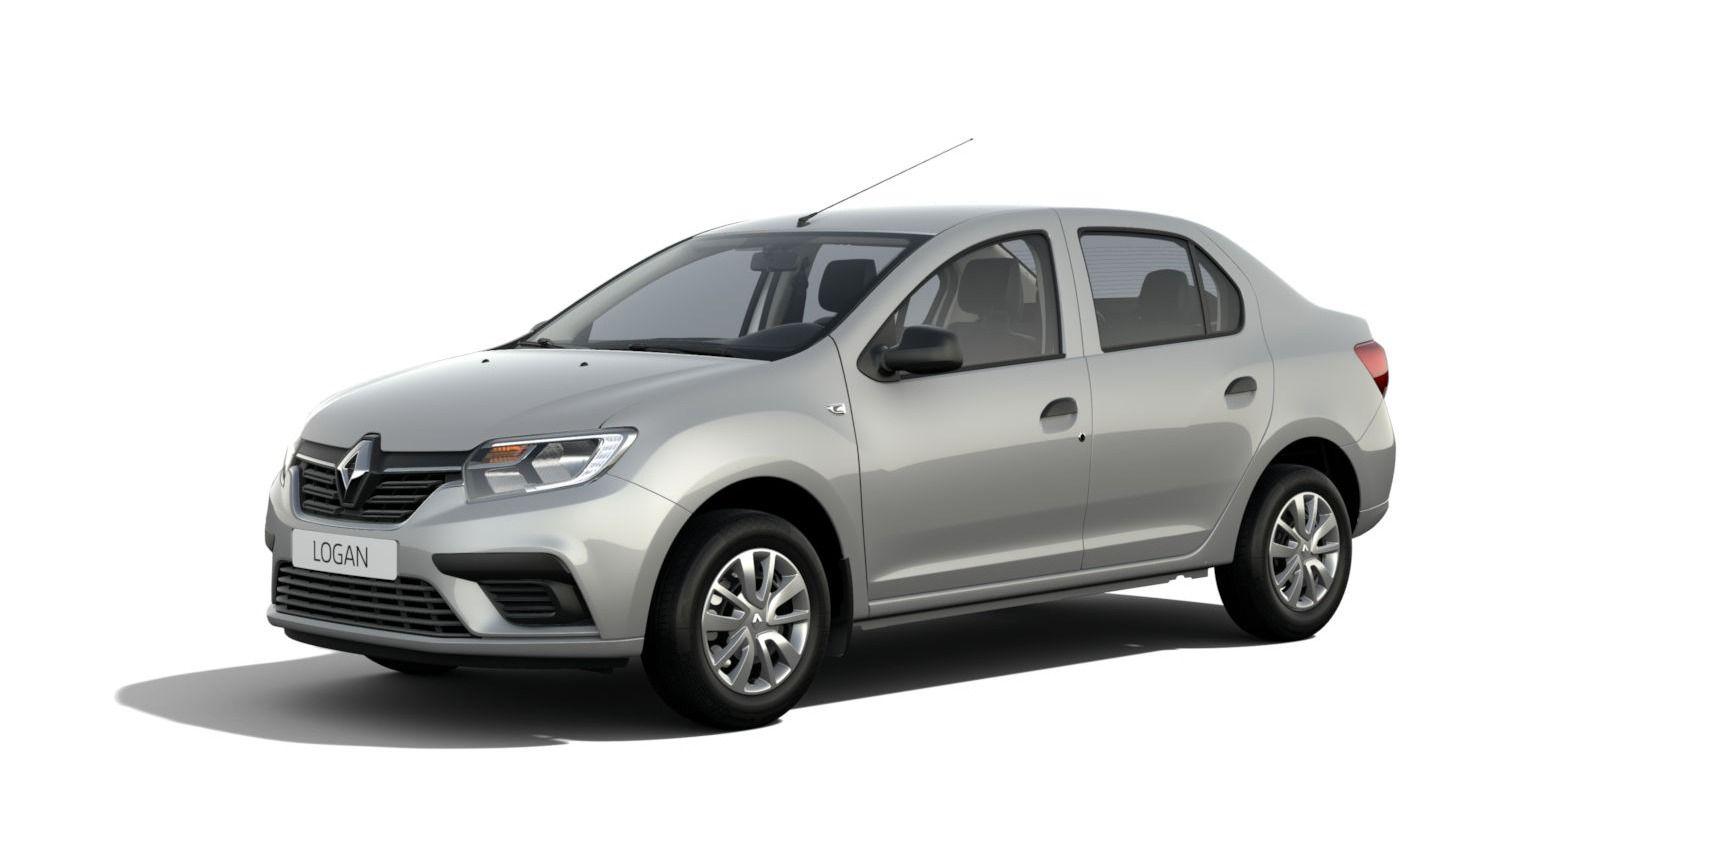 Renault Logan Седан (Access)